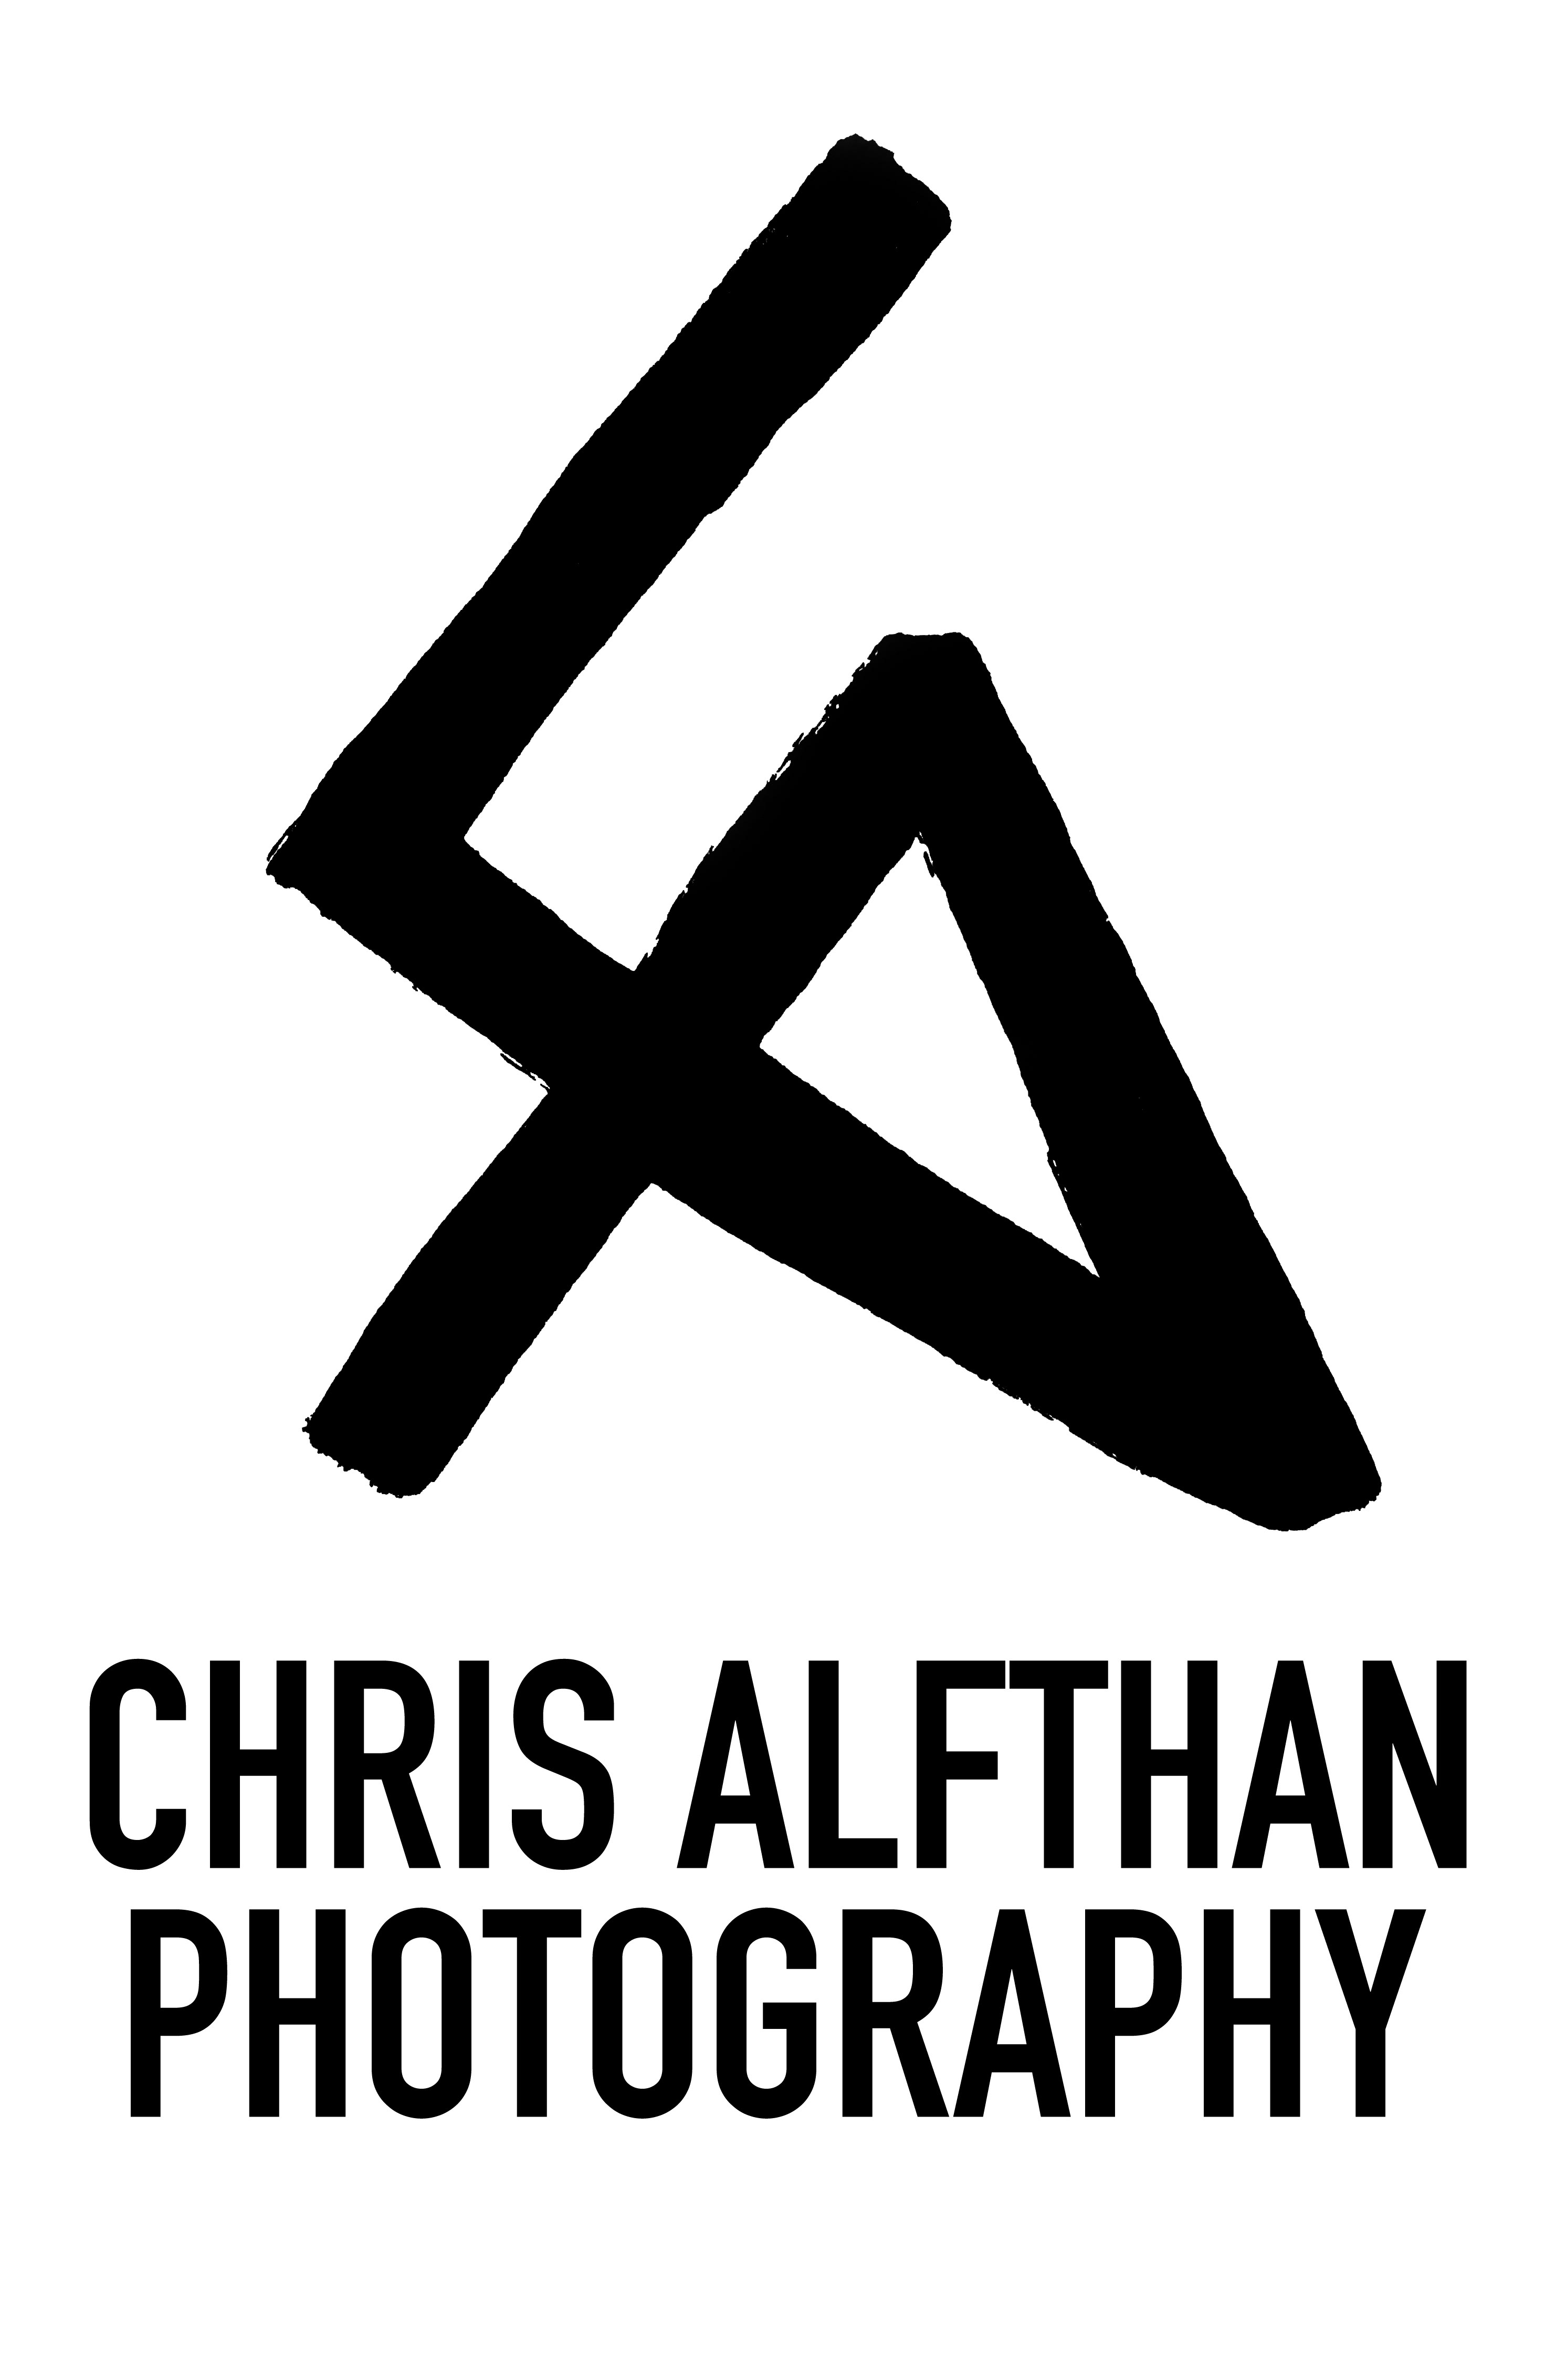 Chris Alfthan Photography